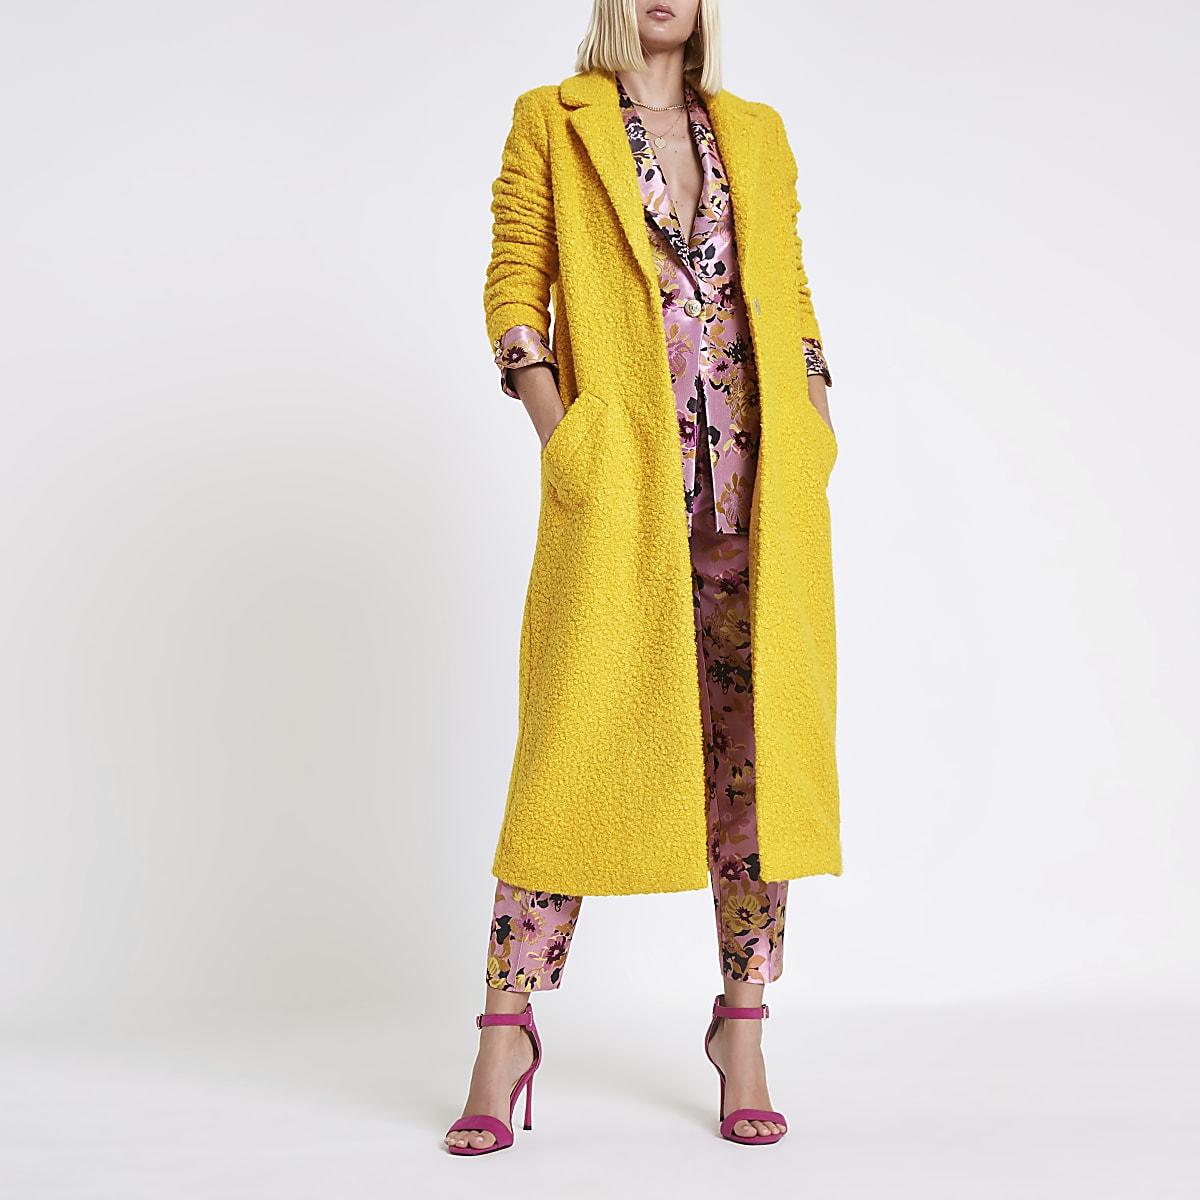 Dark yellow textured longline coat